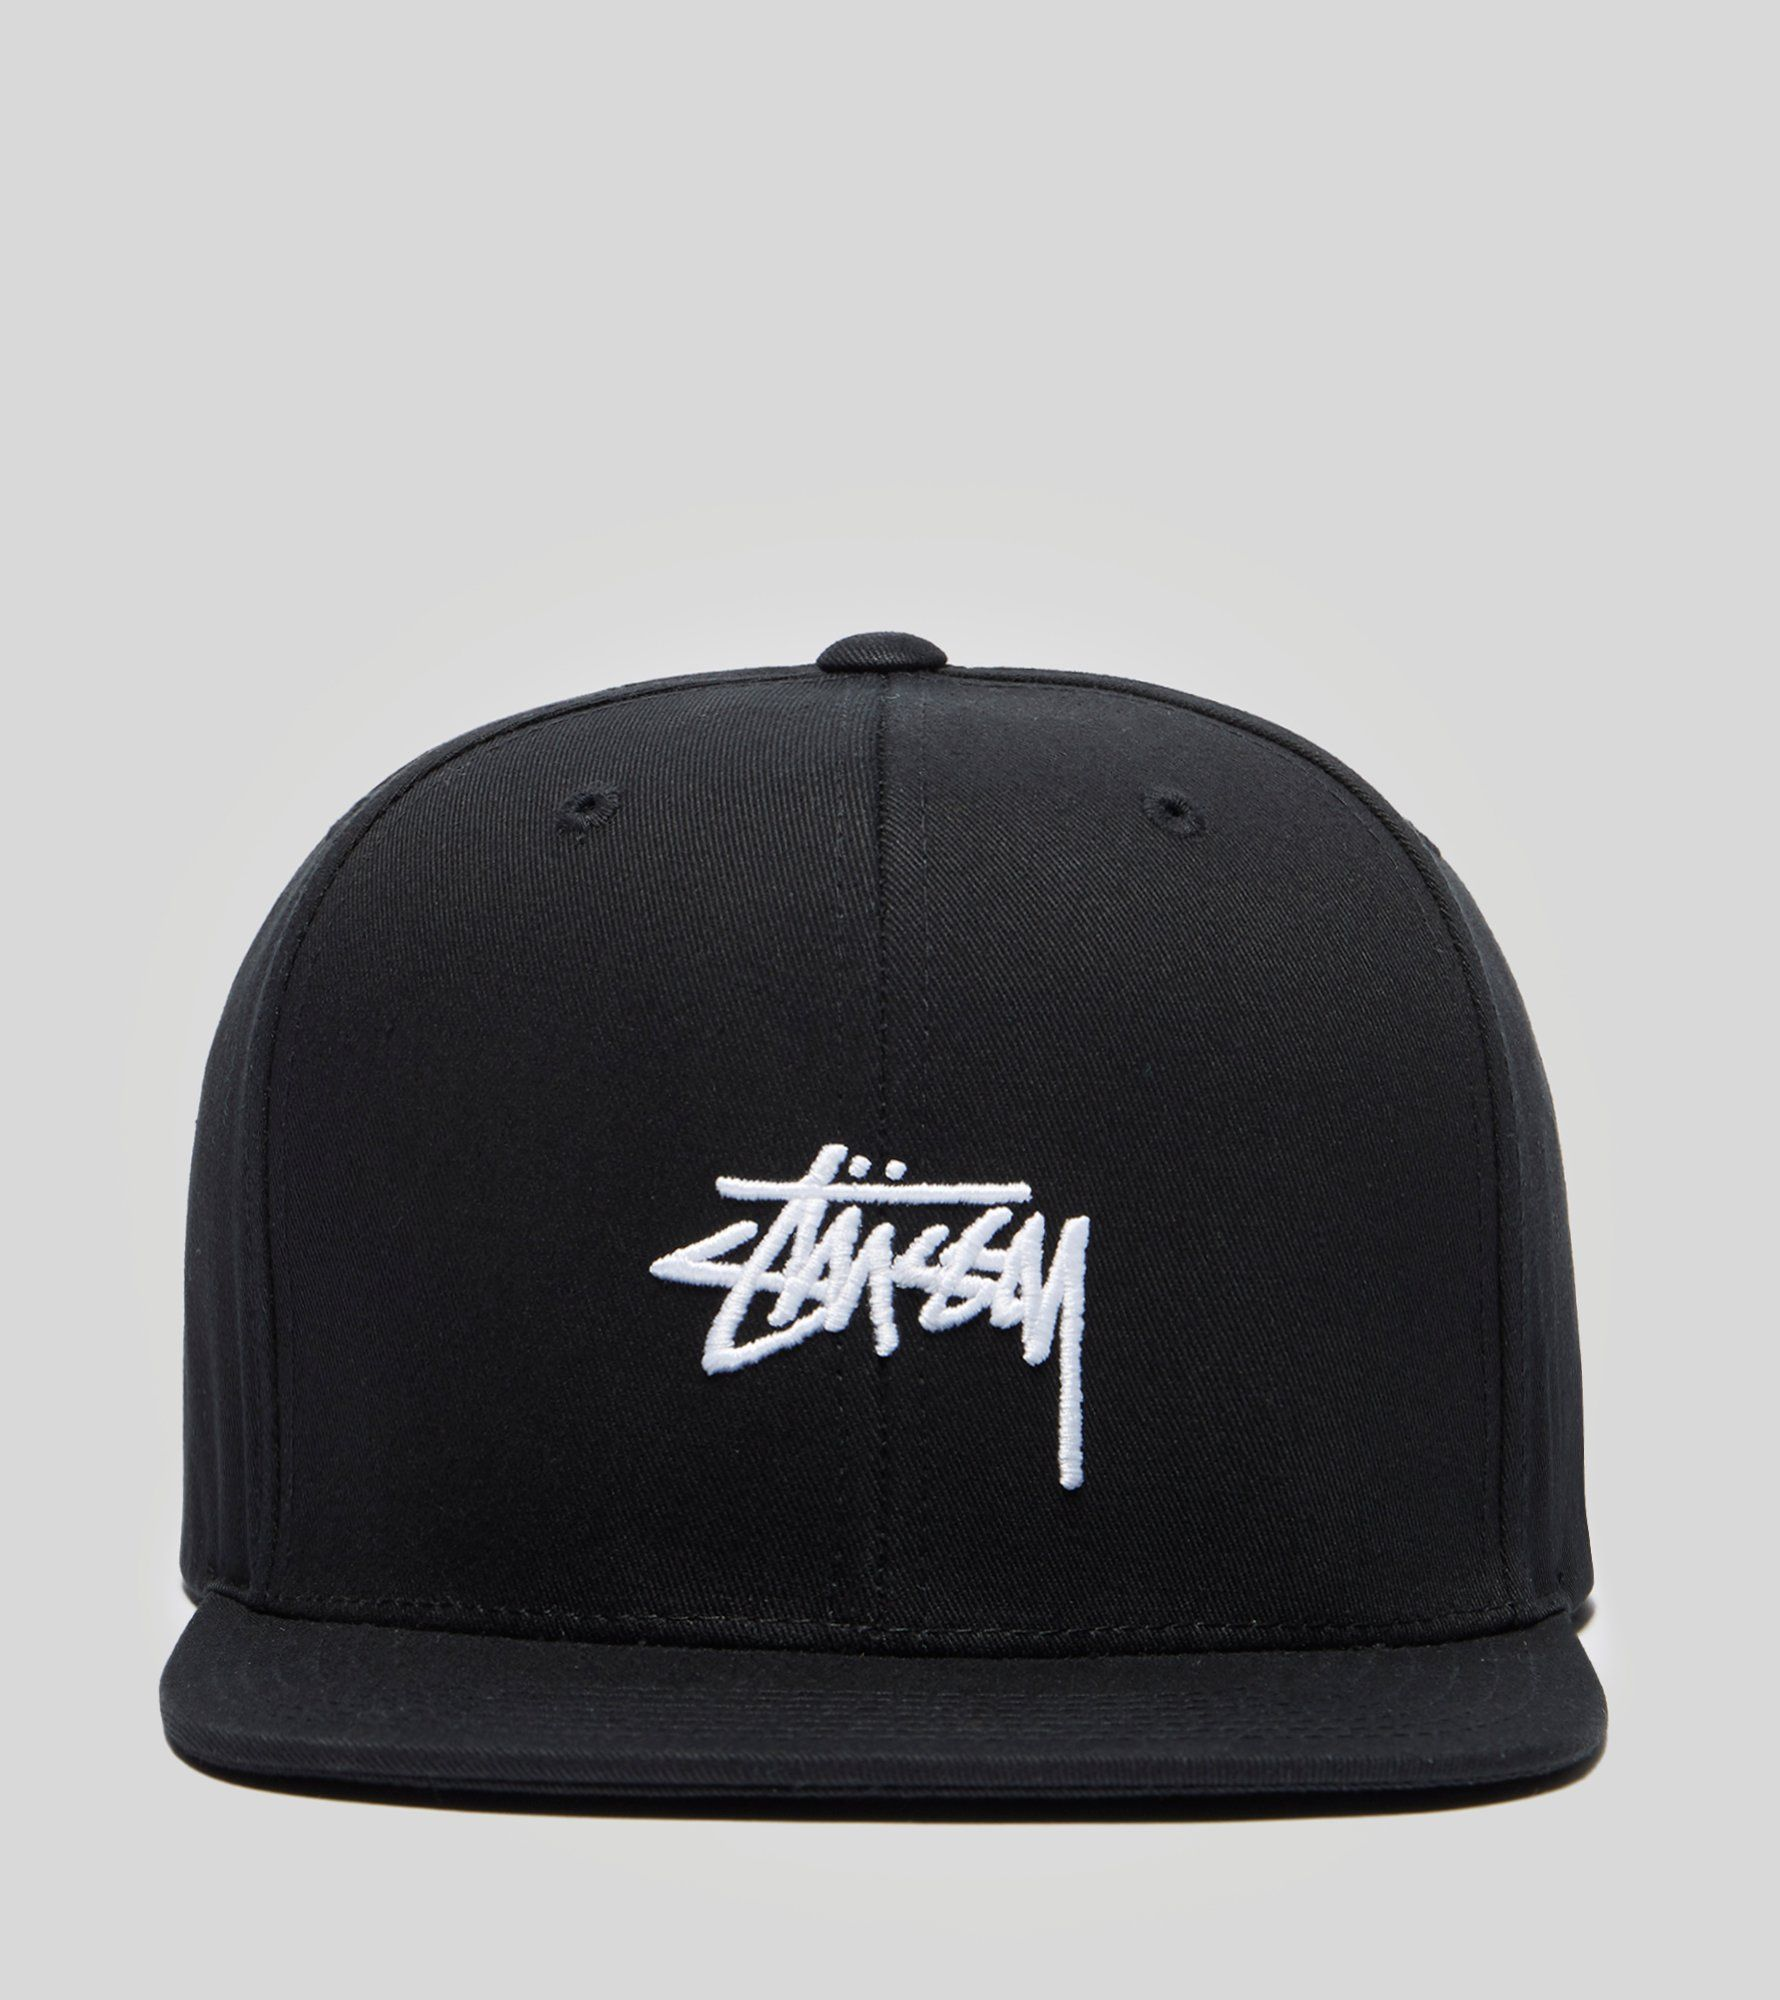 Stussy Stock SU18 Snapback